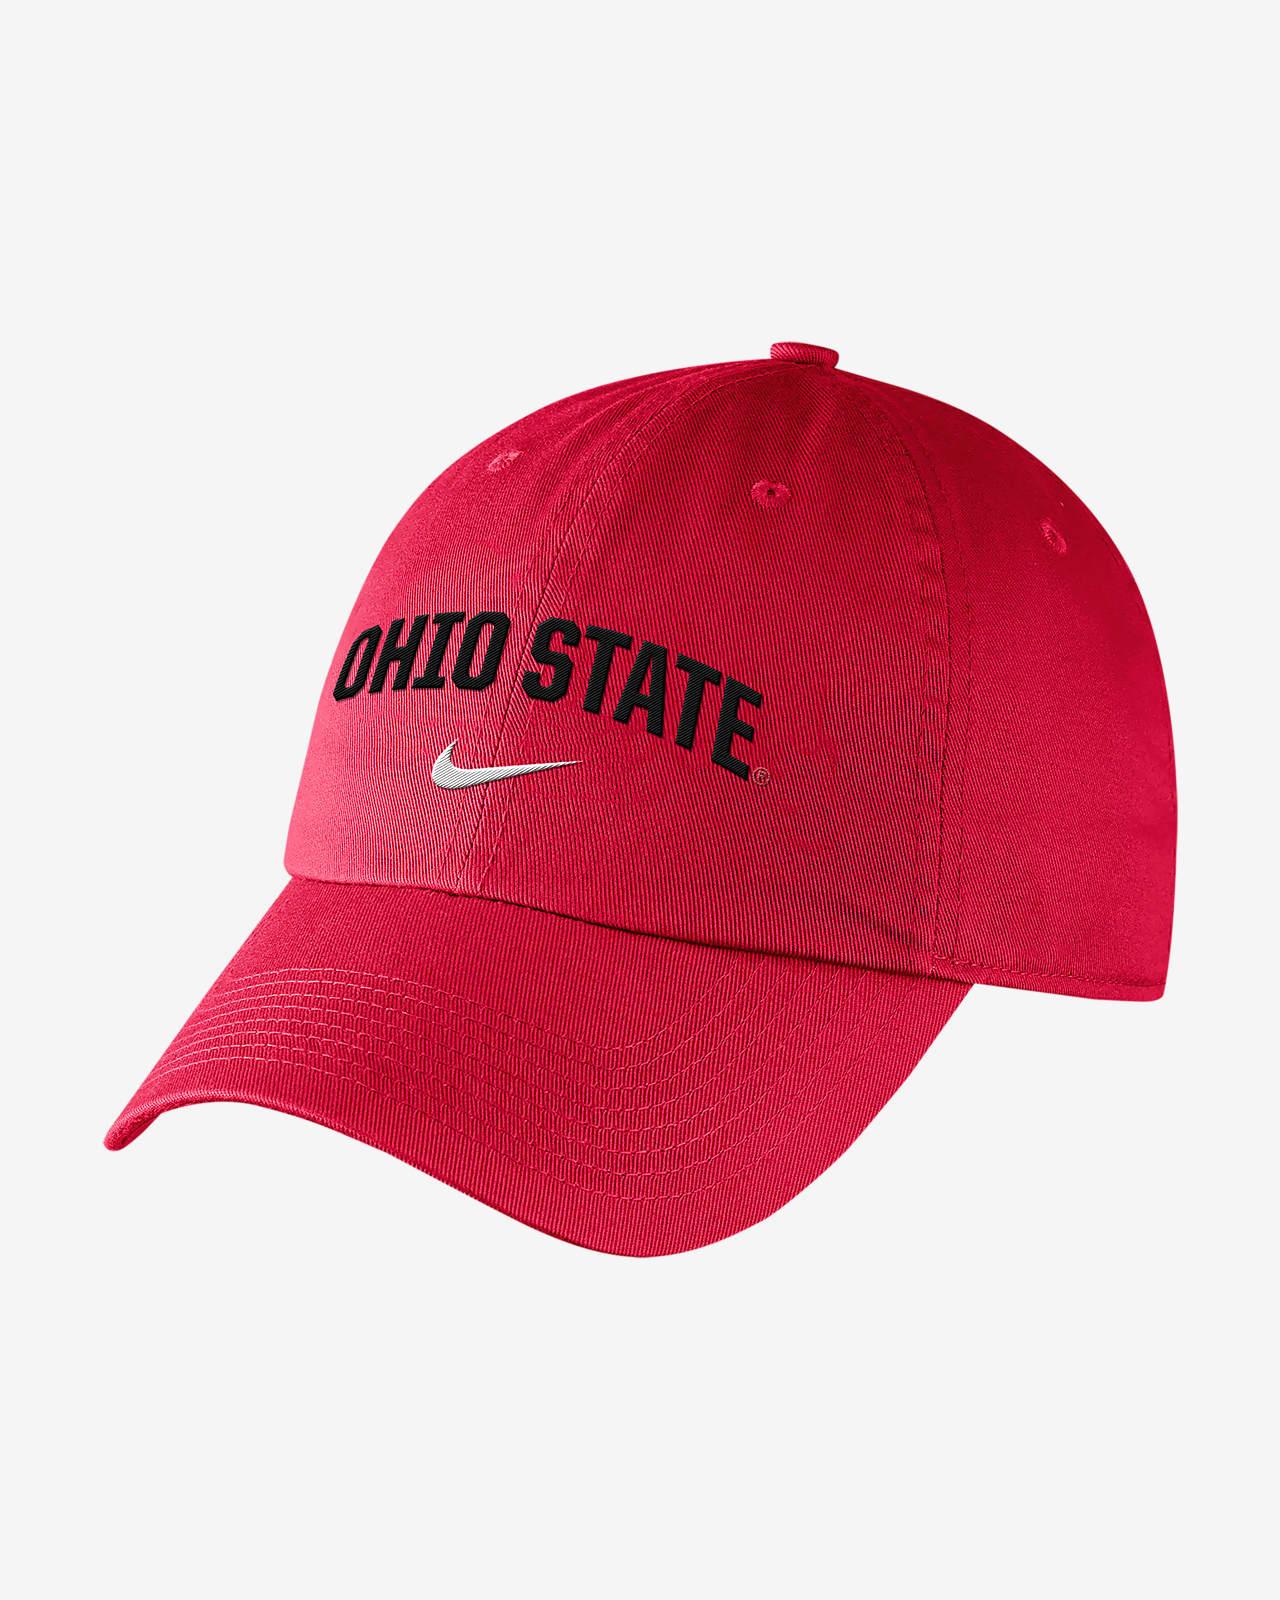 Nike College (Ohio State) Hat